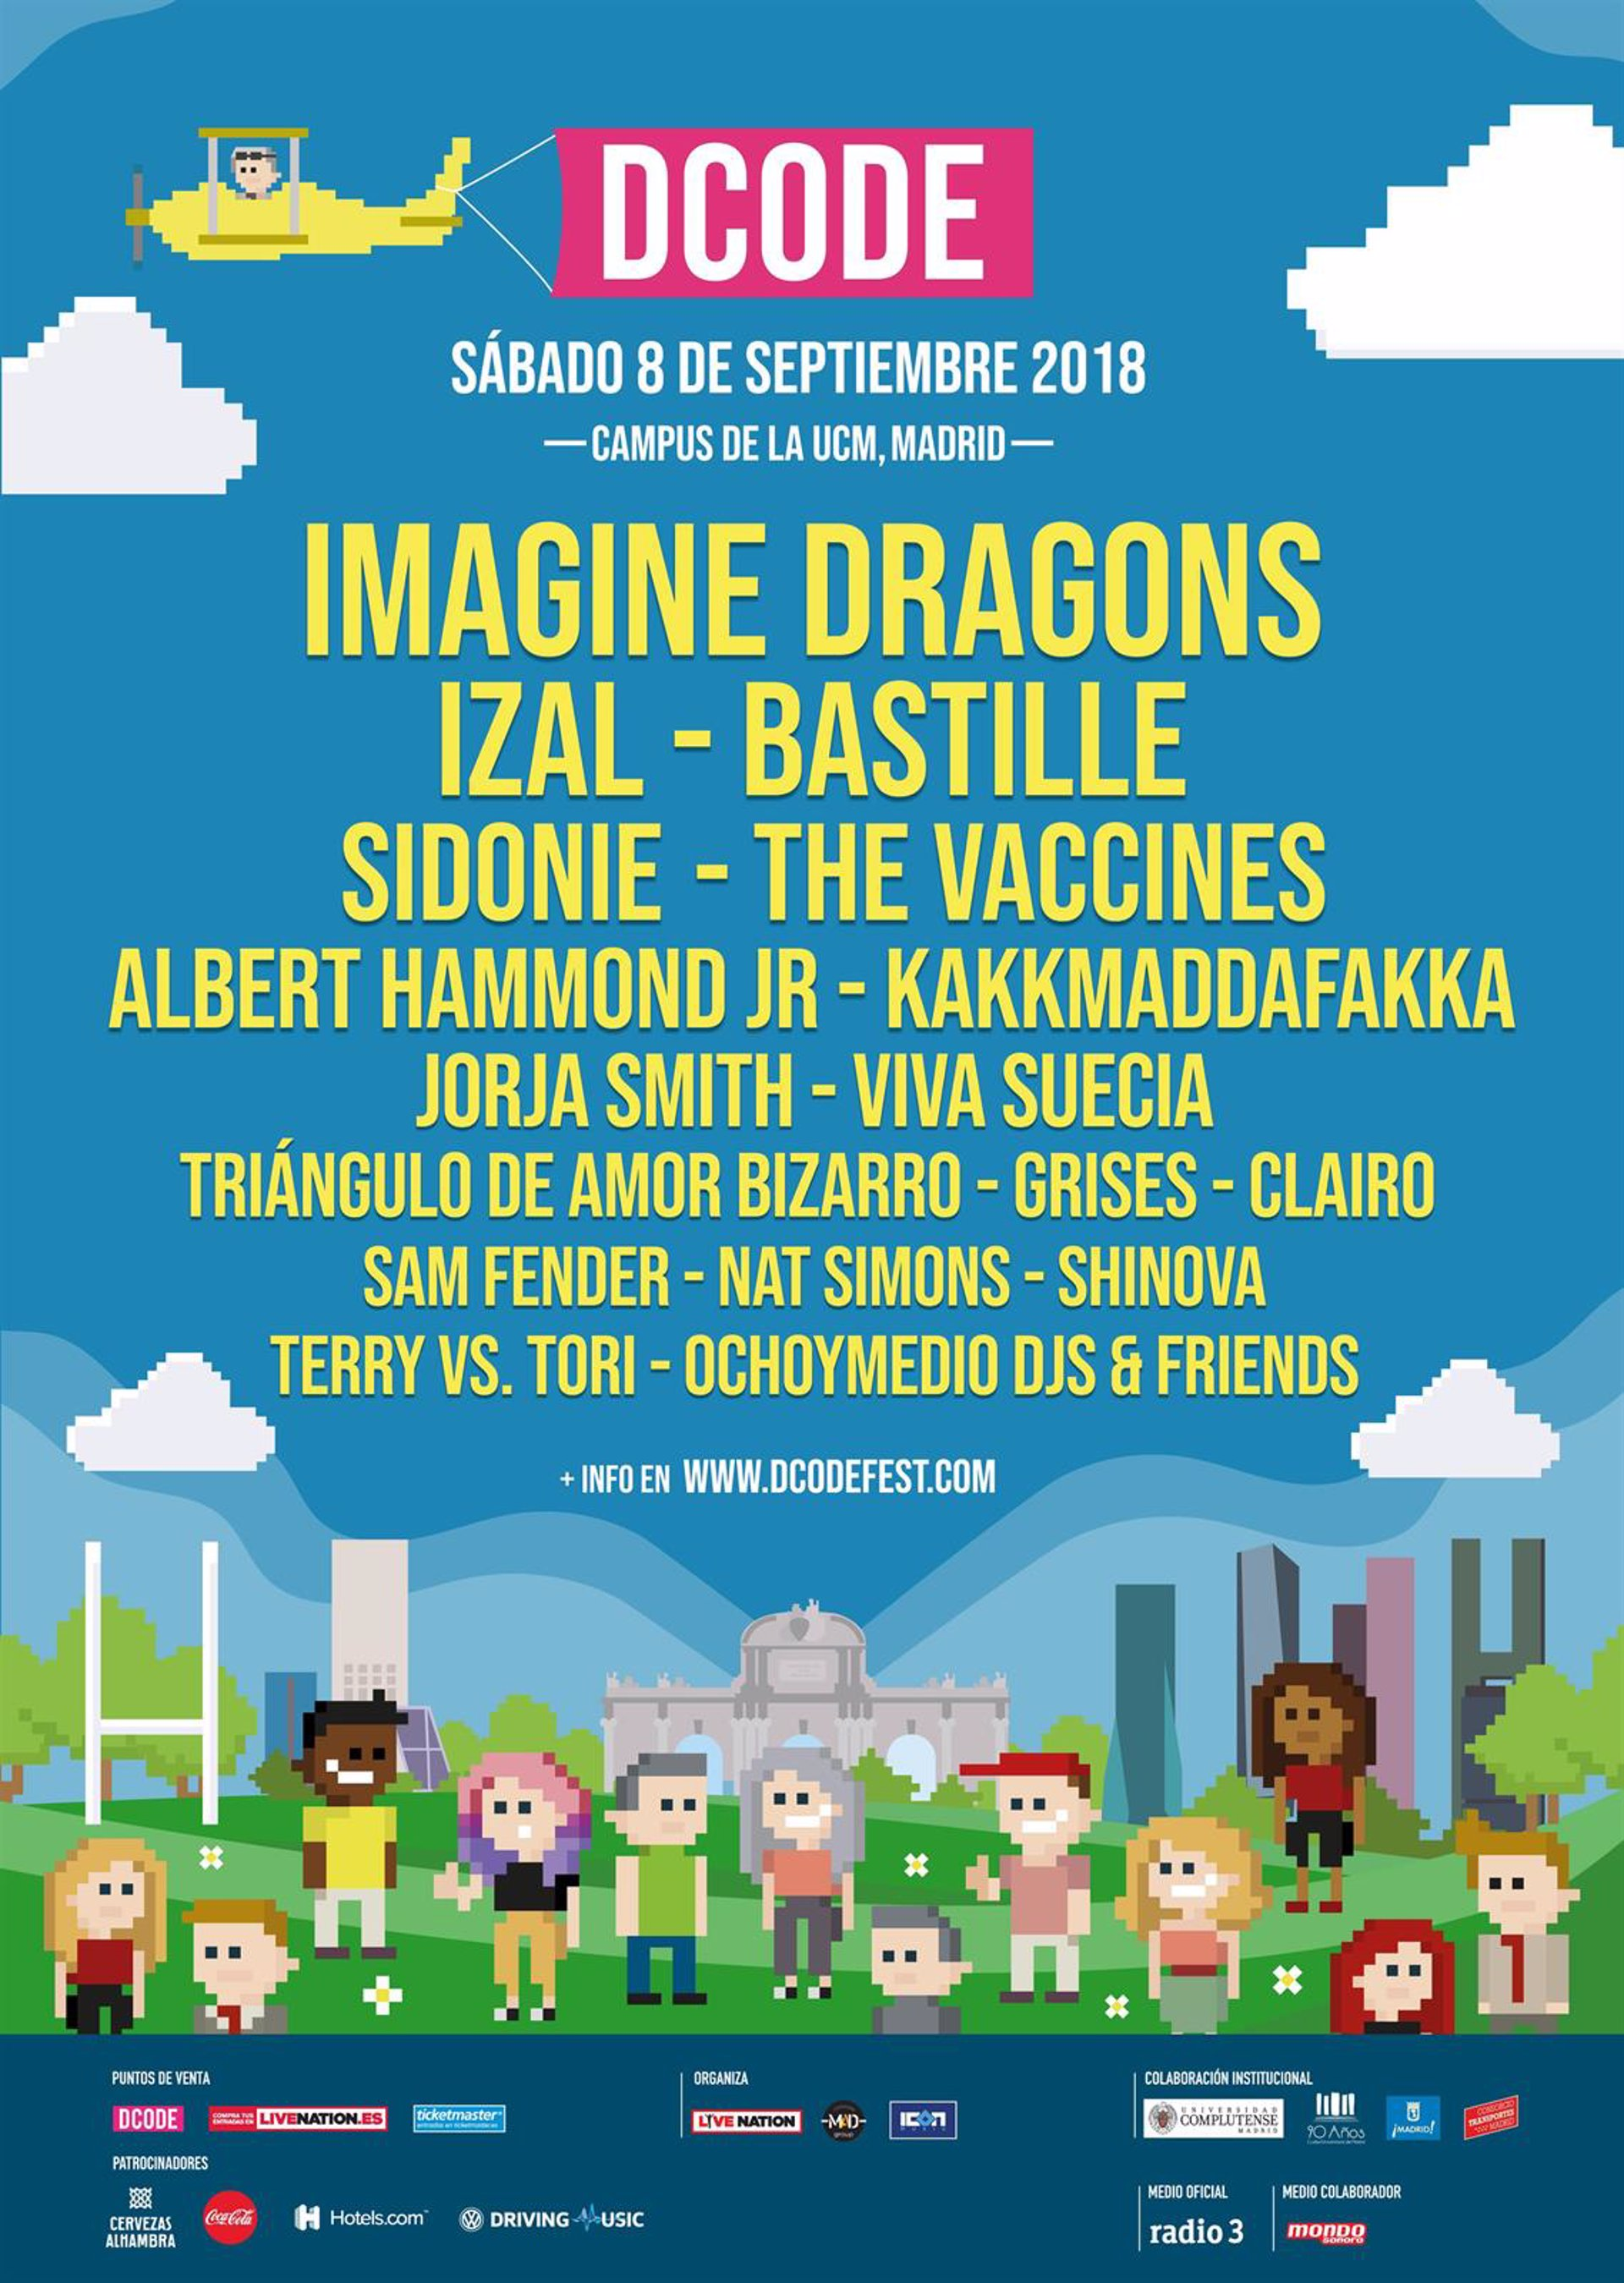 DCODE 2018: Imagine Dragons, Bastille e Izal, cabezas de cartel del ...